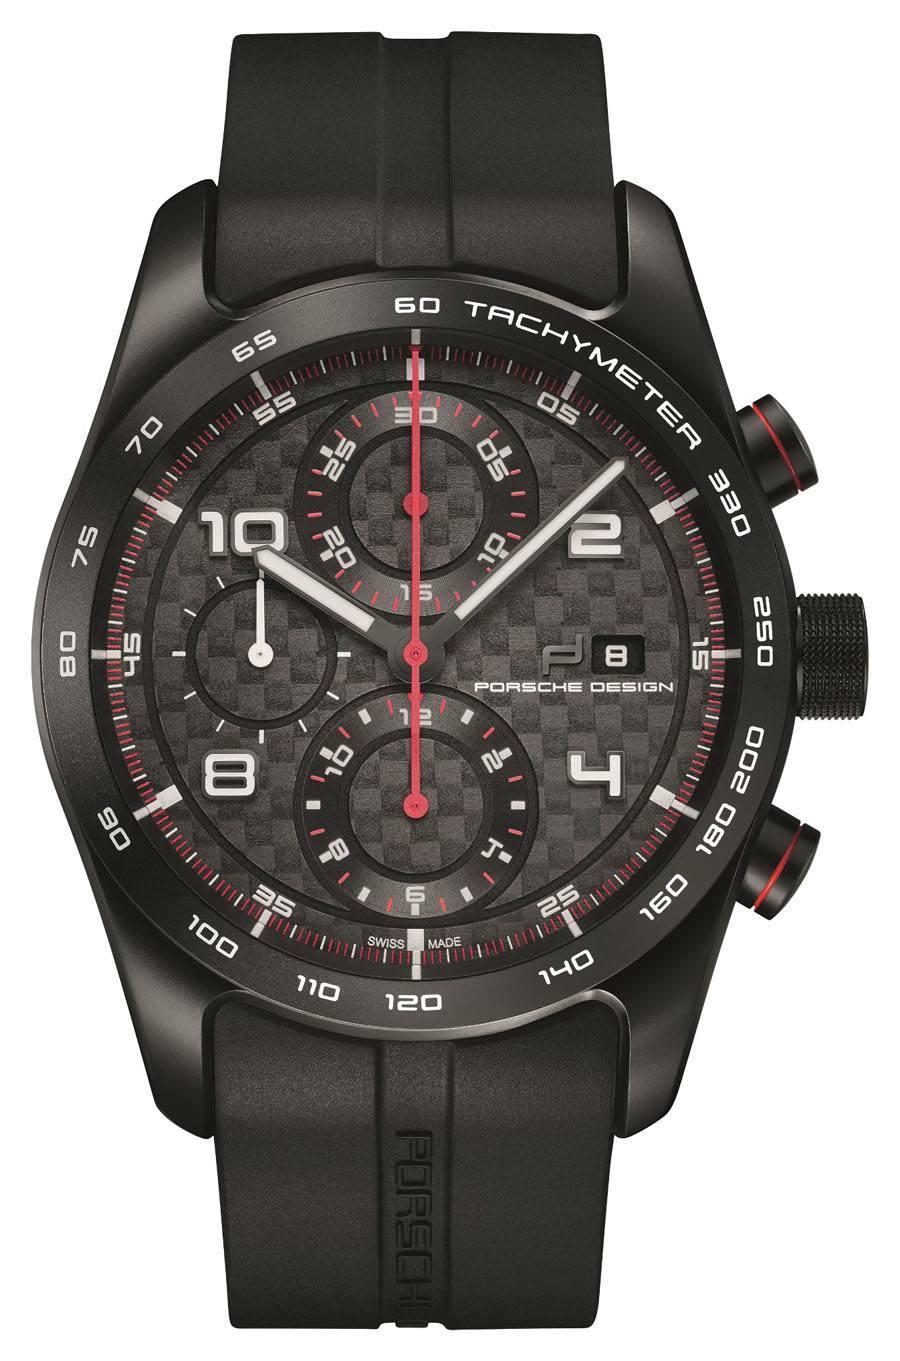 Porsche Design: Chronotimer Series 1